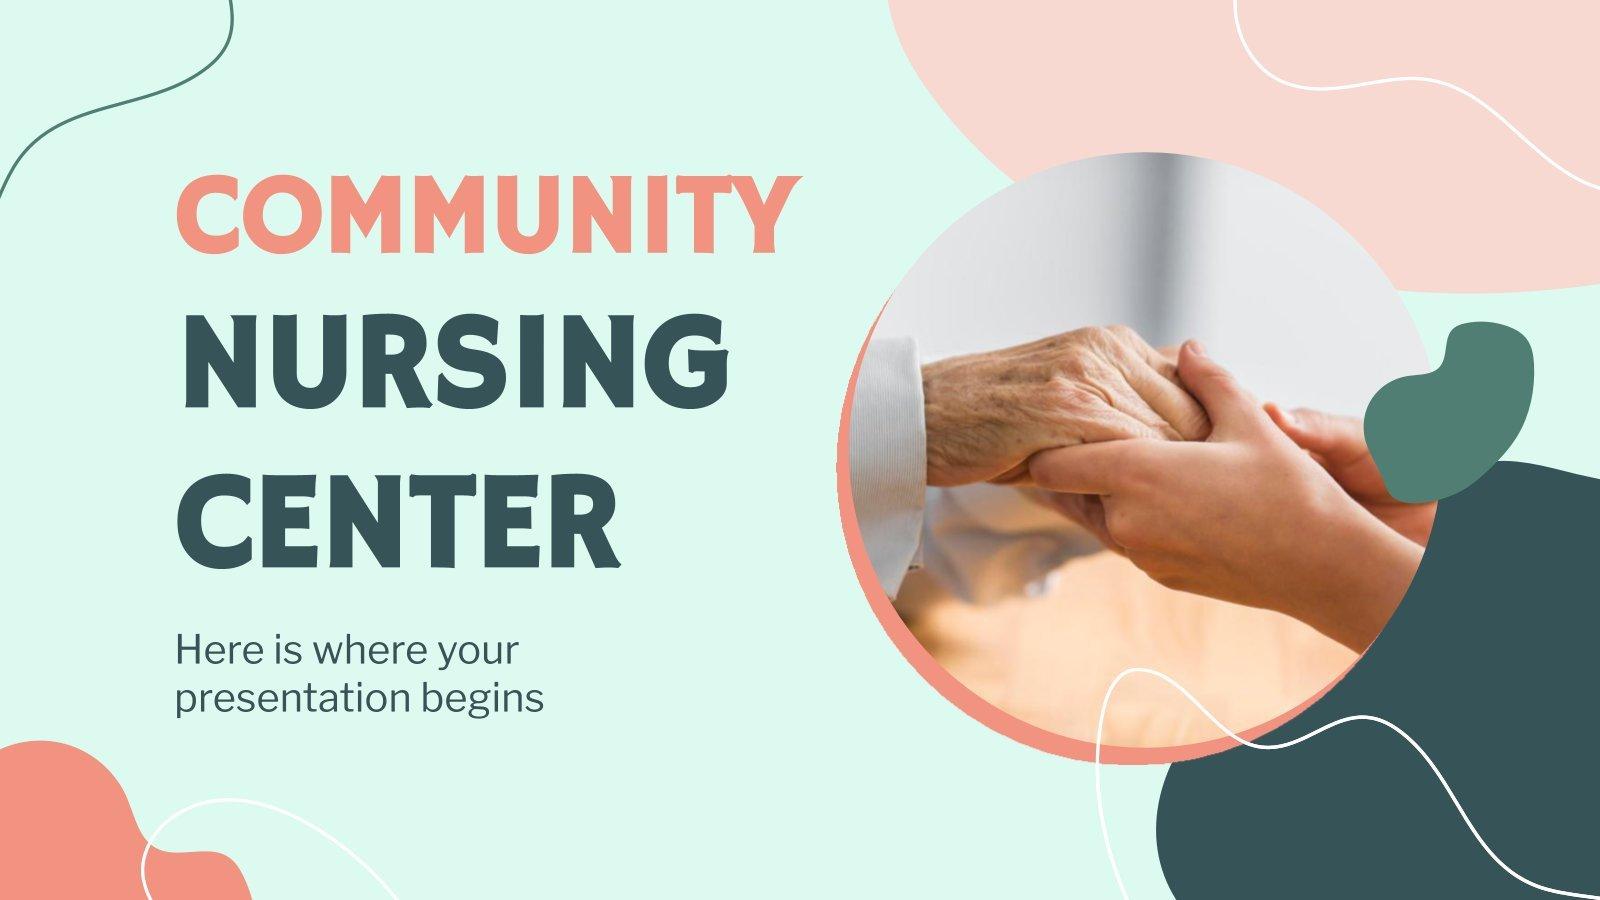 Community Nursing Center presentation template